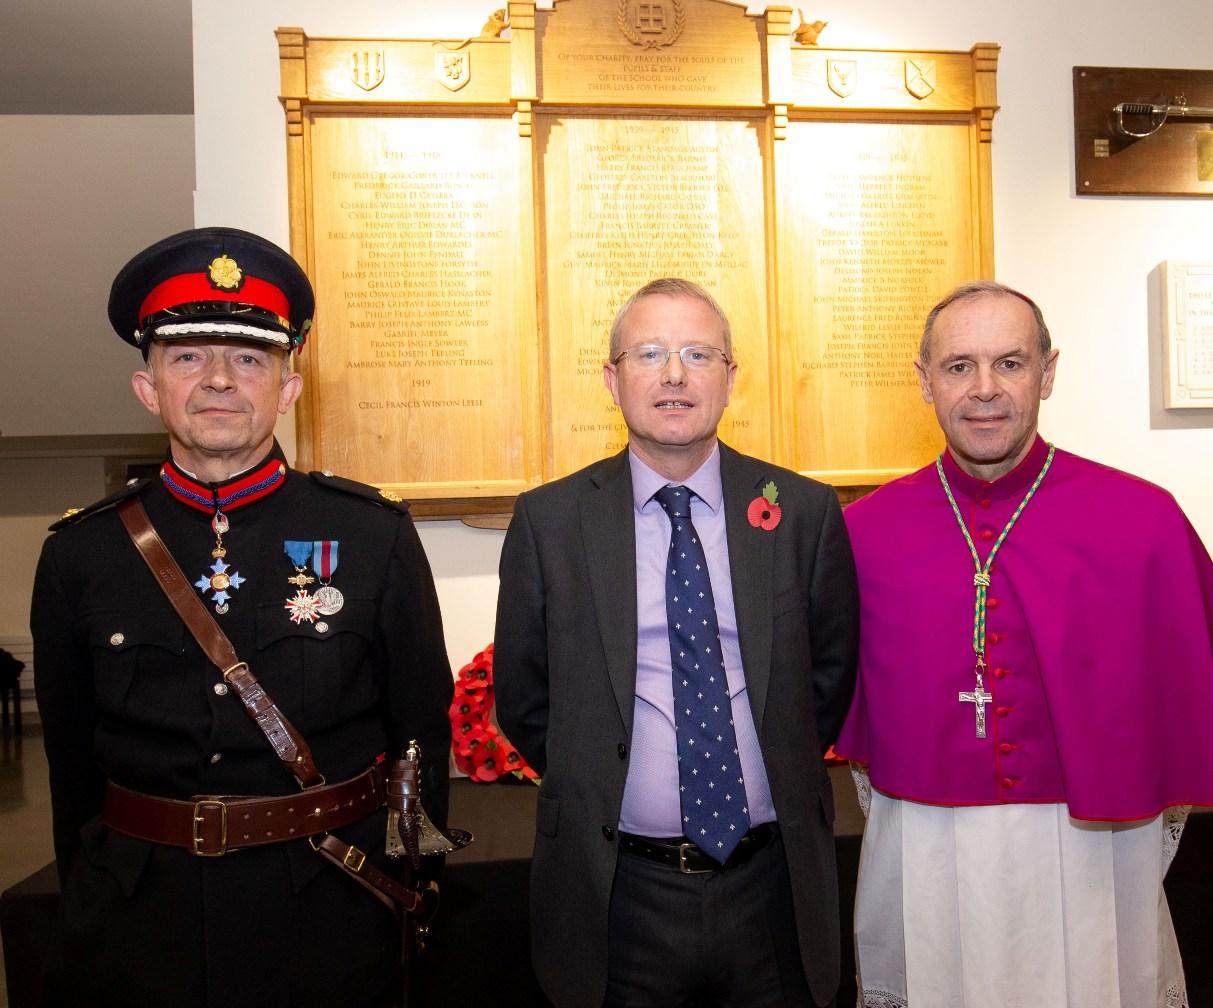 New war memorial unveiled at Ealing school